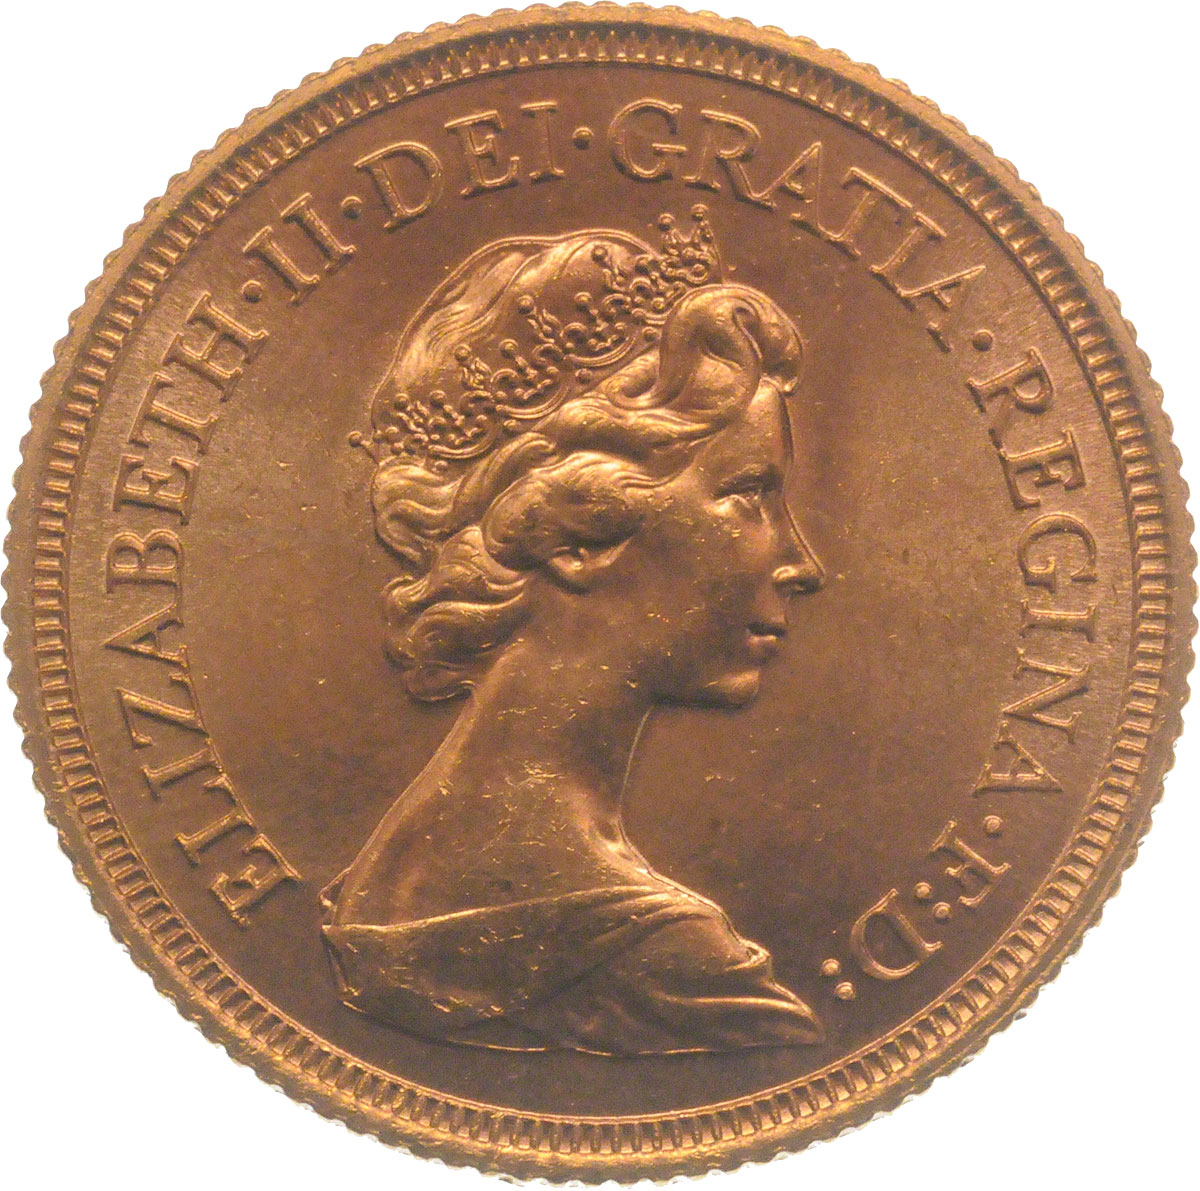 1976 Gold Sovereign